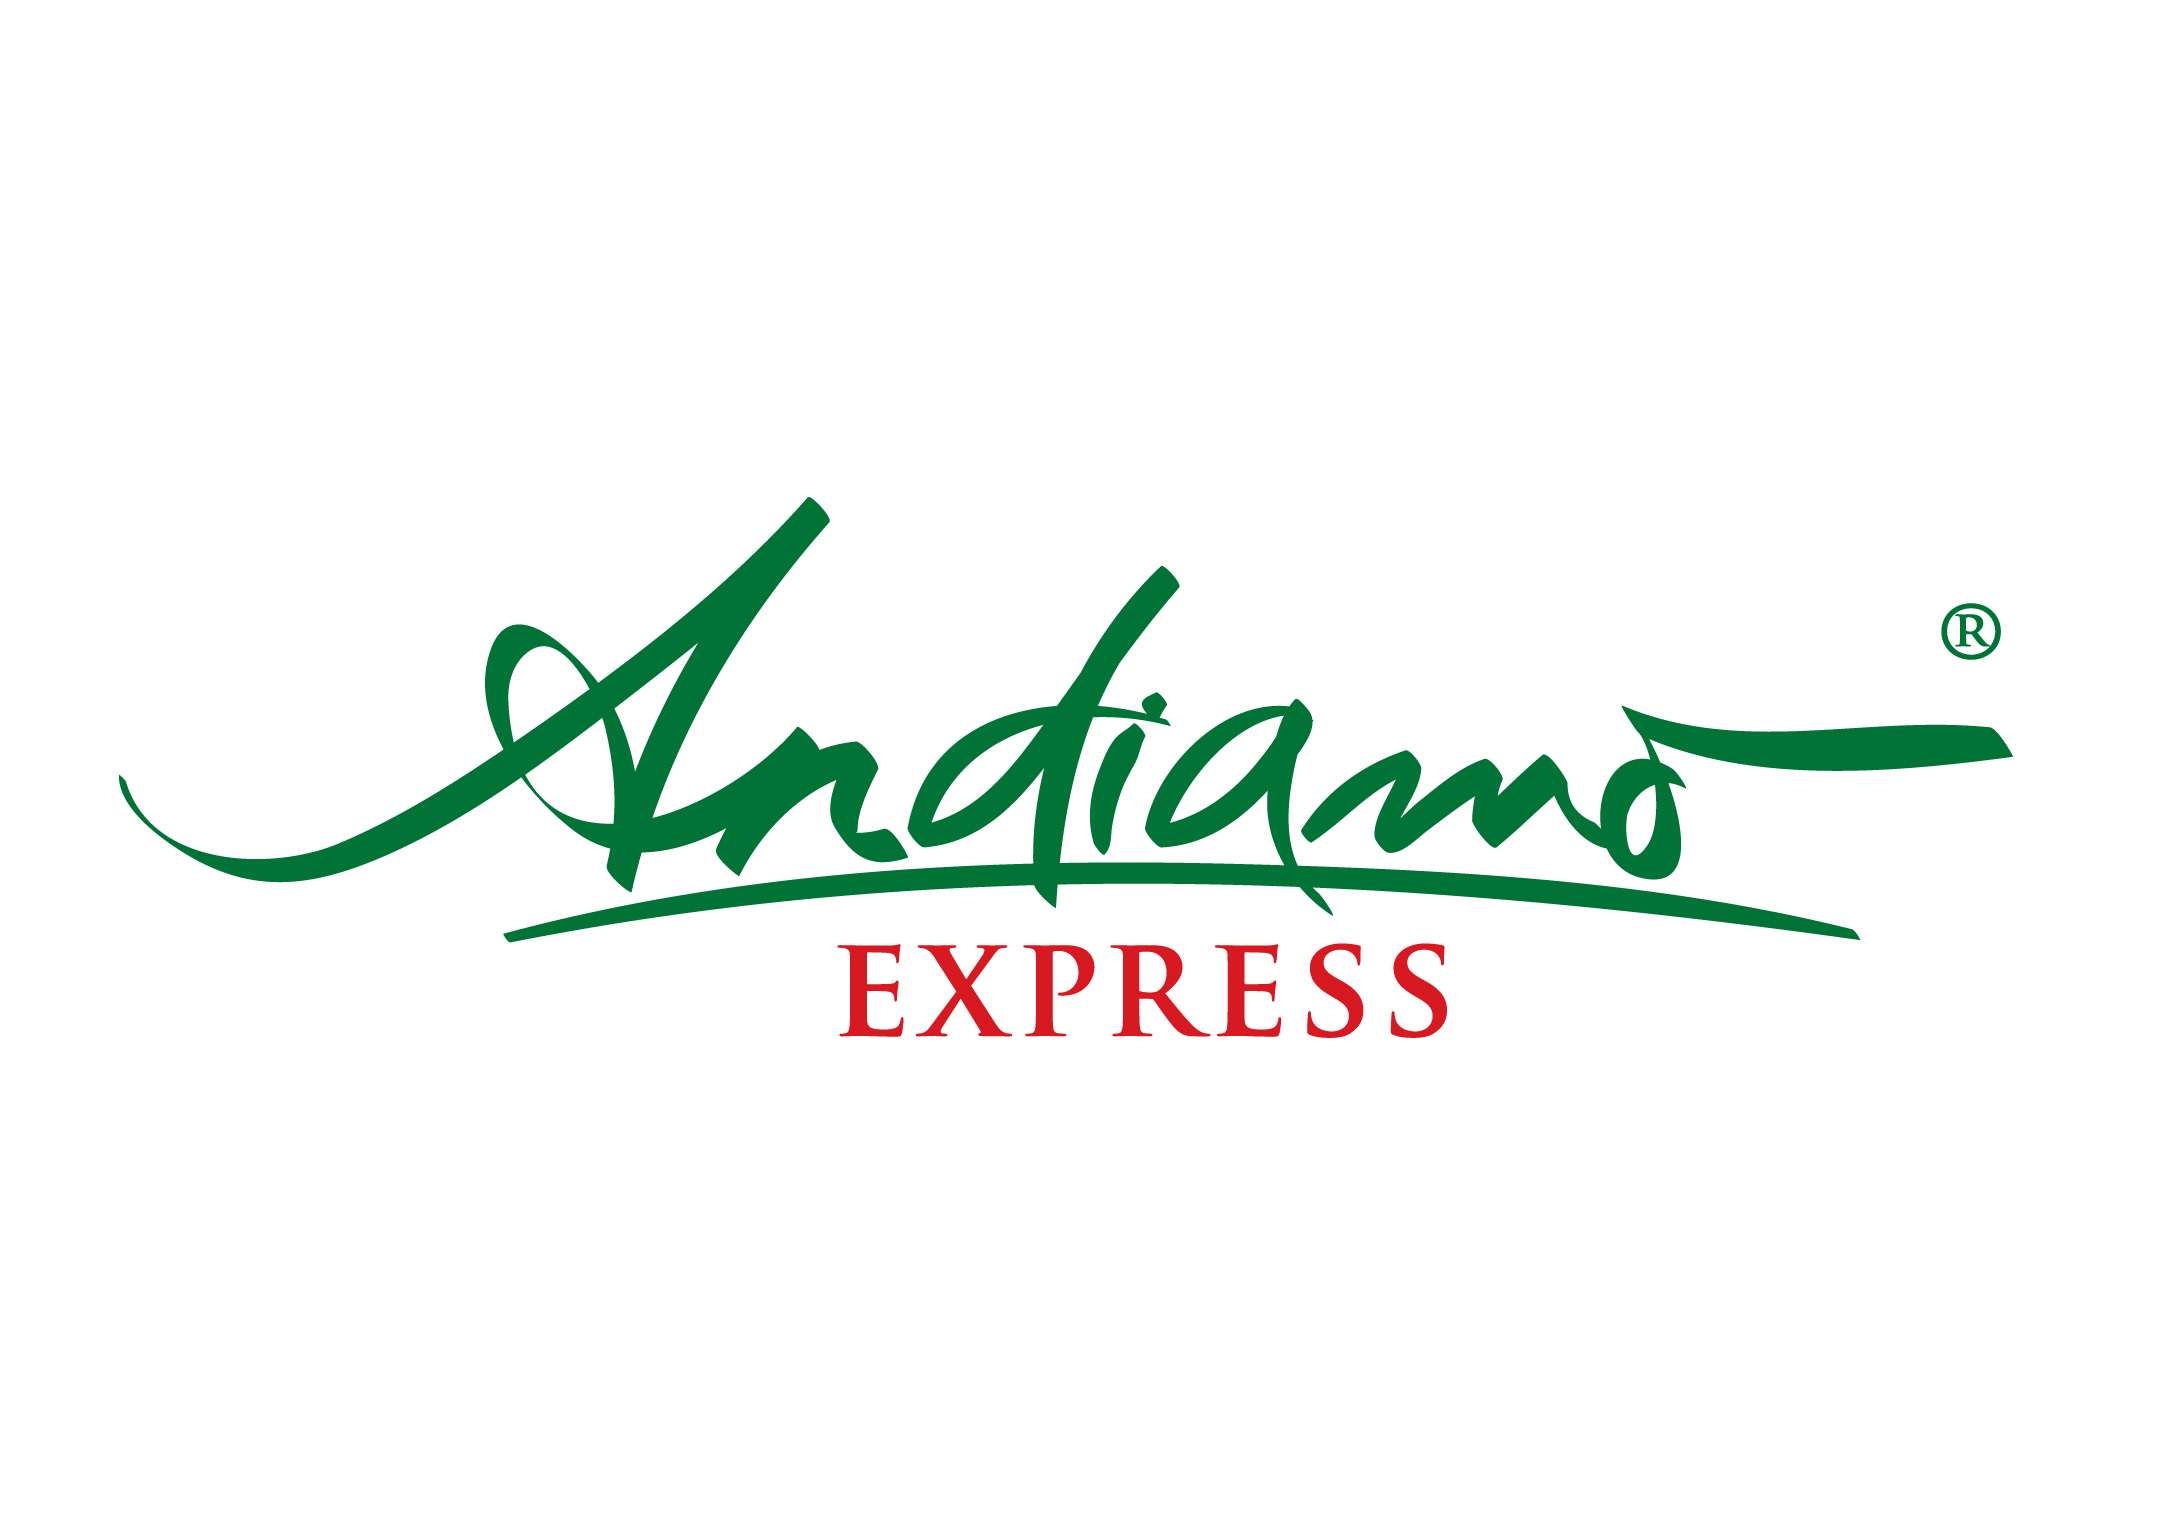 Andiamo Express